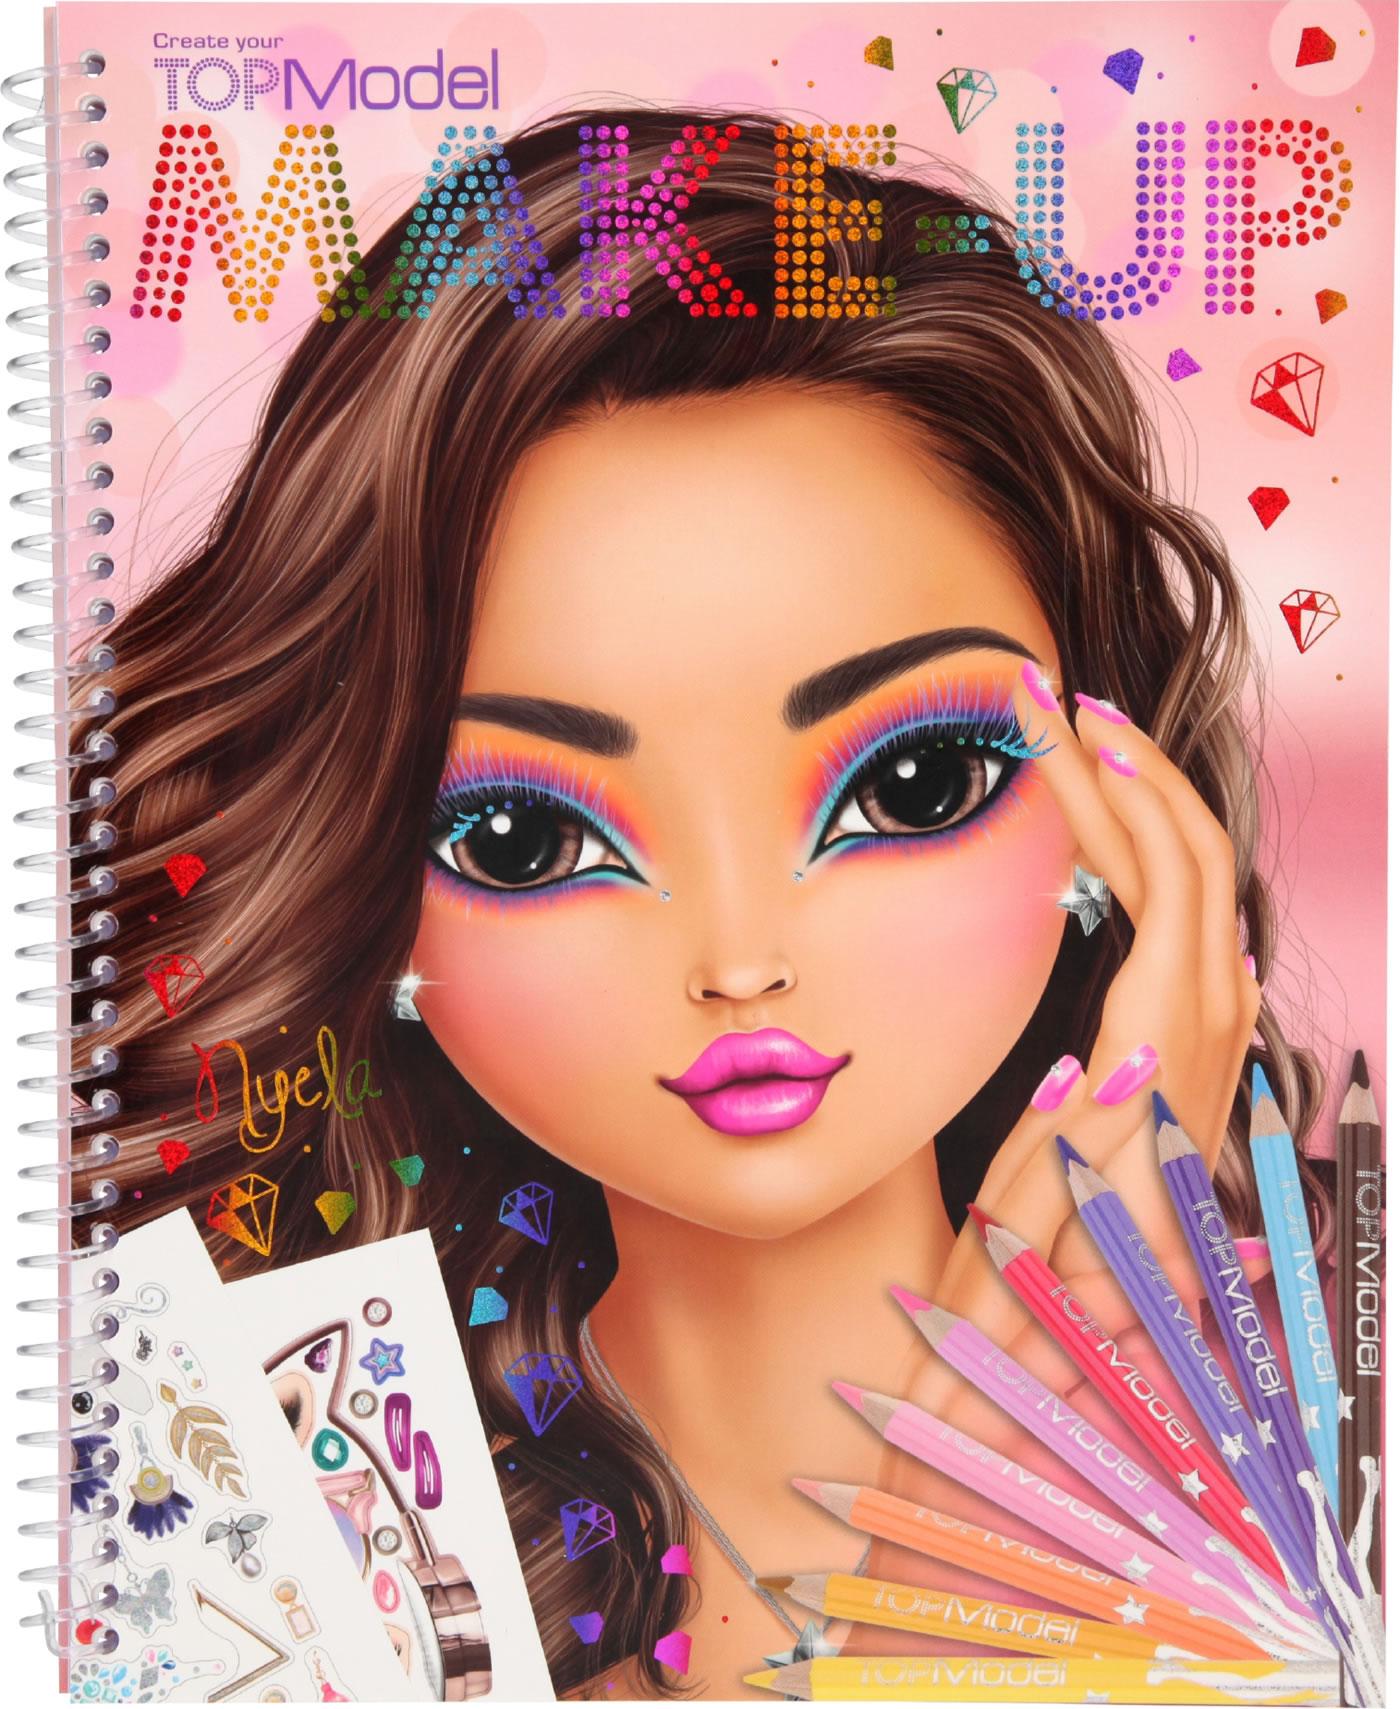 Topmodel Livre A Colorier Create Topmodel Make Up Nyela